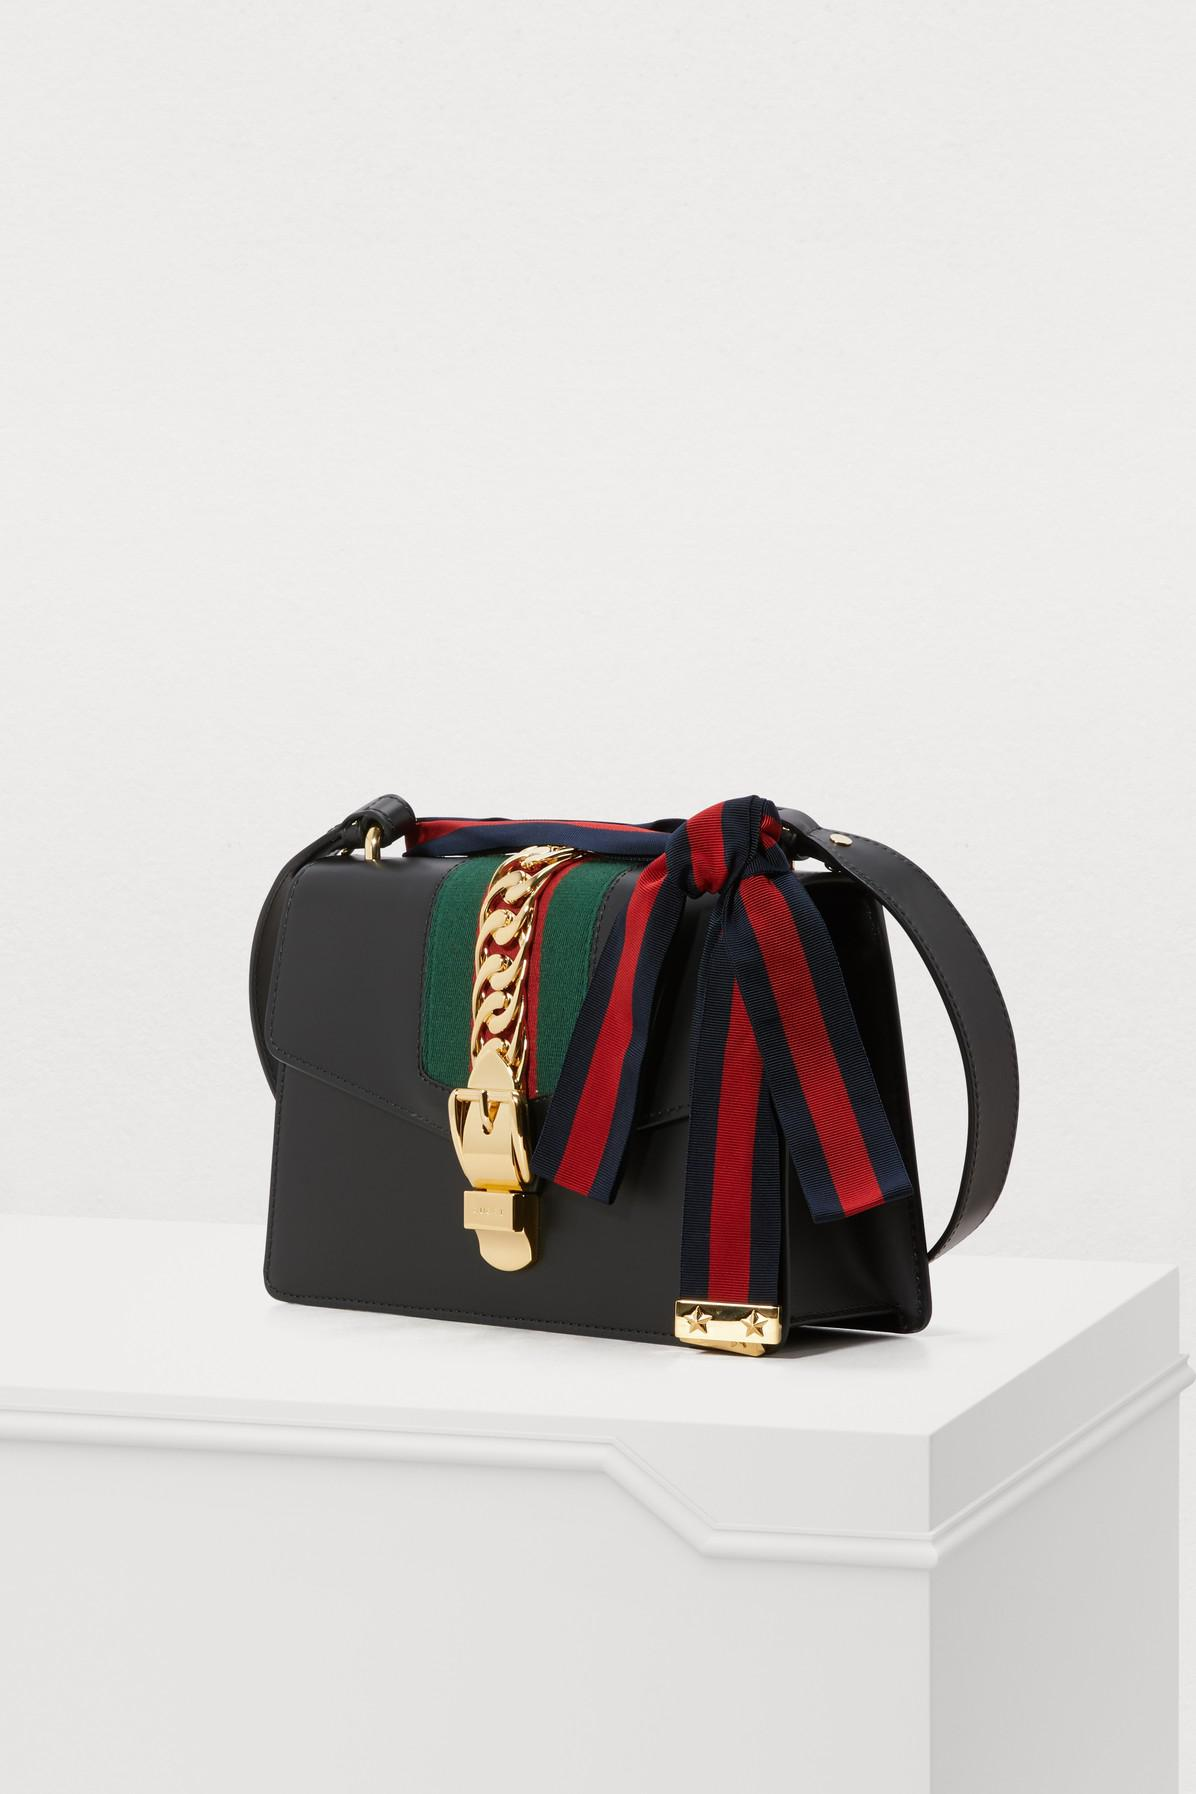 ca8ede46cc9b Gucci - Black Sylvie Leather Shoulder Bag - Lyst. View fullscreen